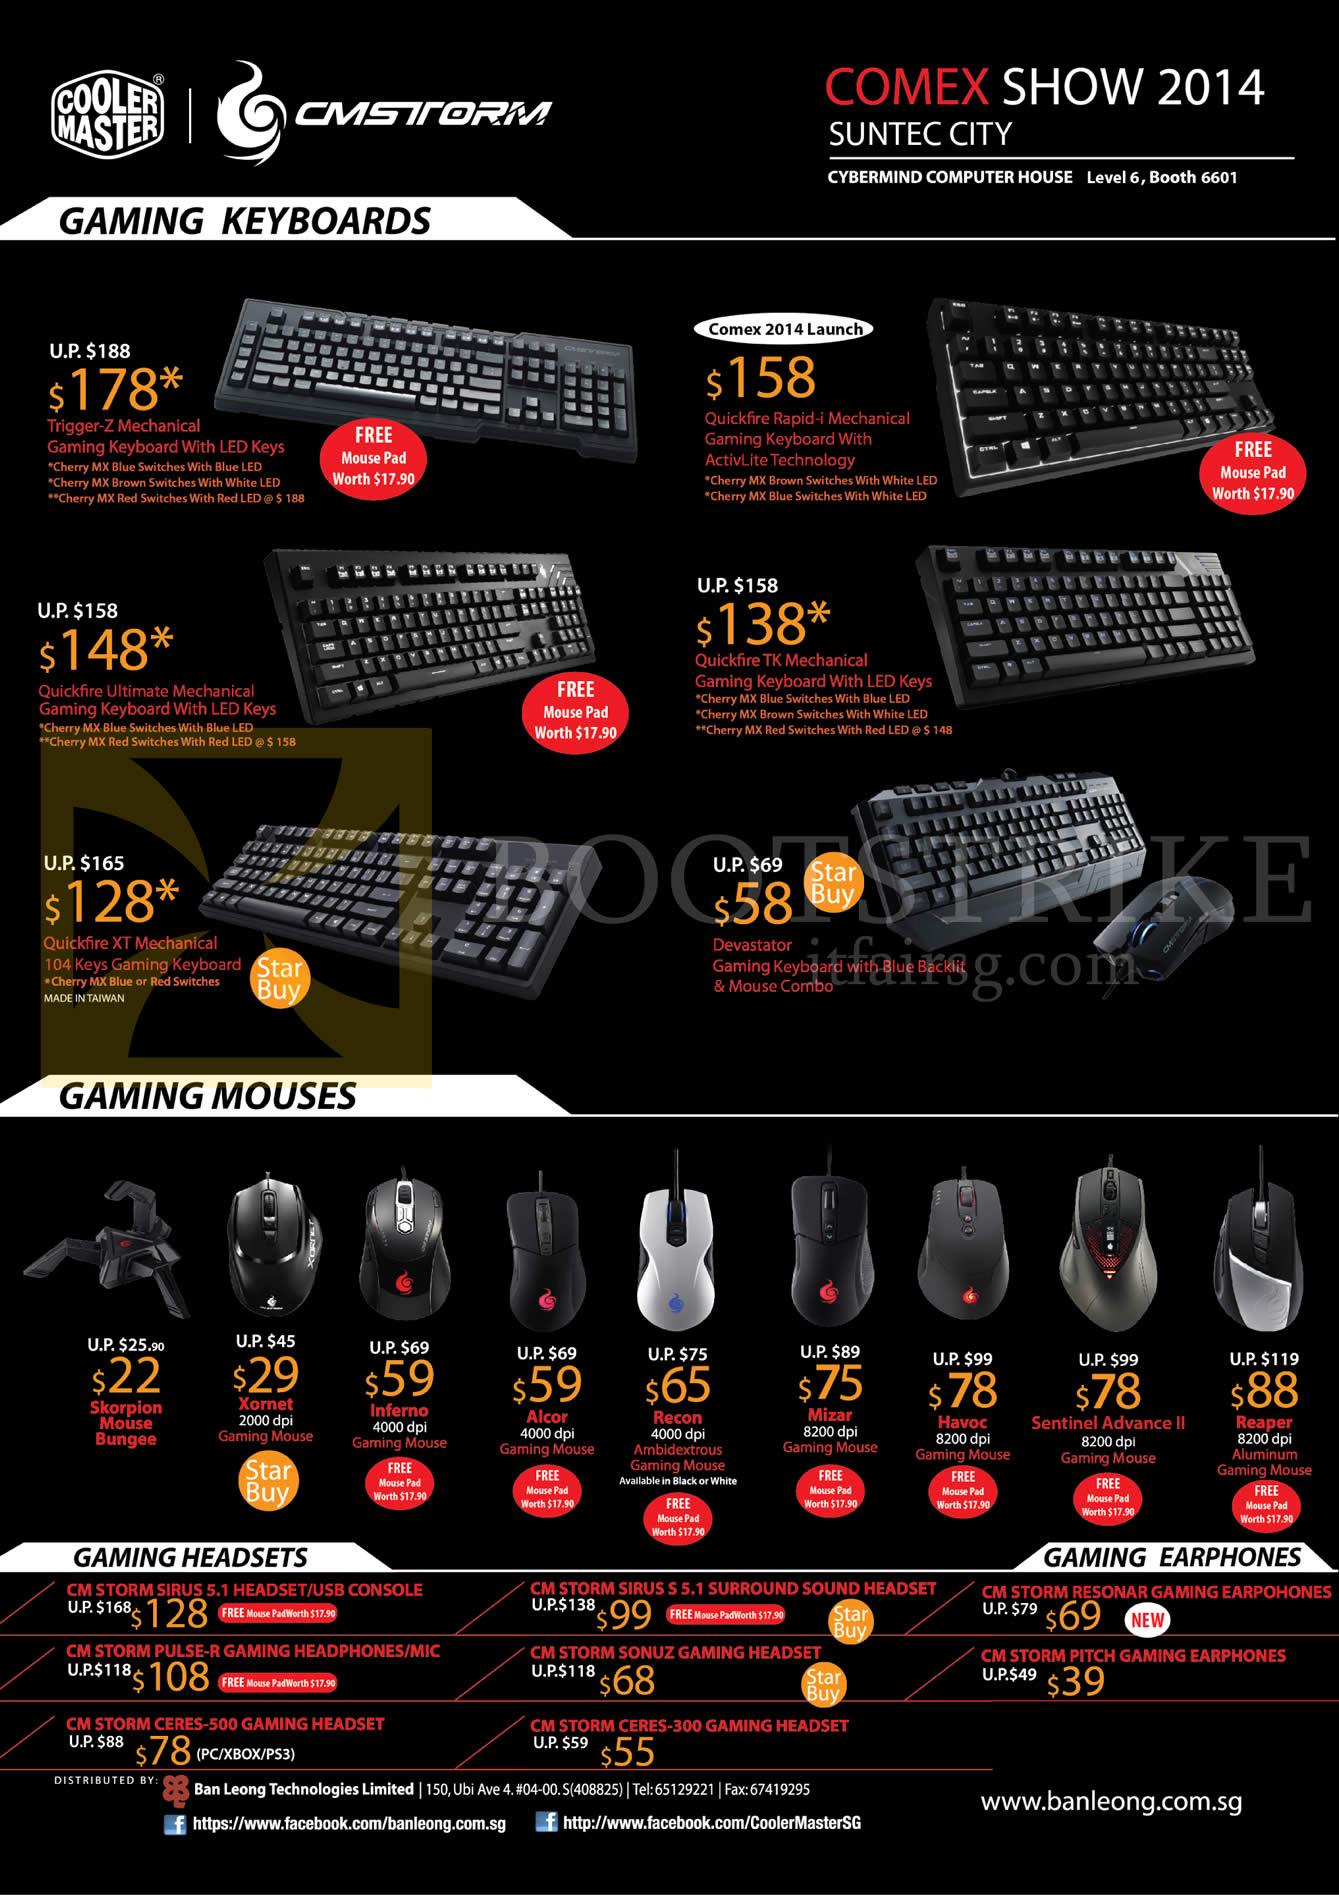 COMEX 2014 price list image brochure of Cybermind Cooler Master CMStorm Keyboards, Mouse, Gaming Headsets, Earphones, Quickfire XT Mechanical, Devastator, Xornet, Alcor, Mizar, Reaper, Sirus, Pulse-R, Resonar, Pitch